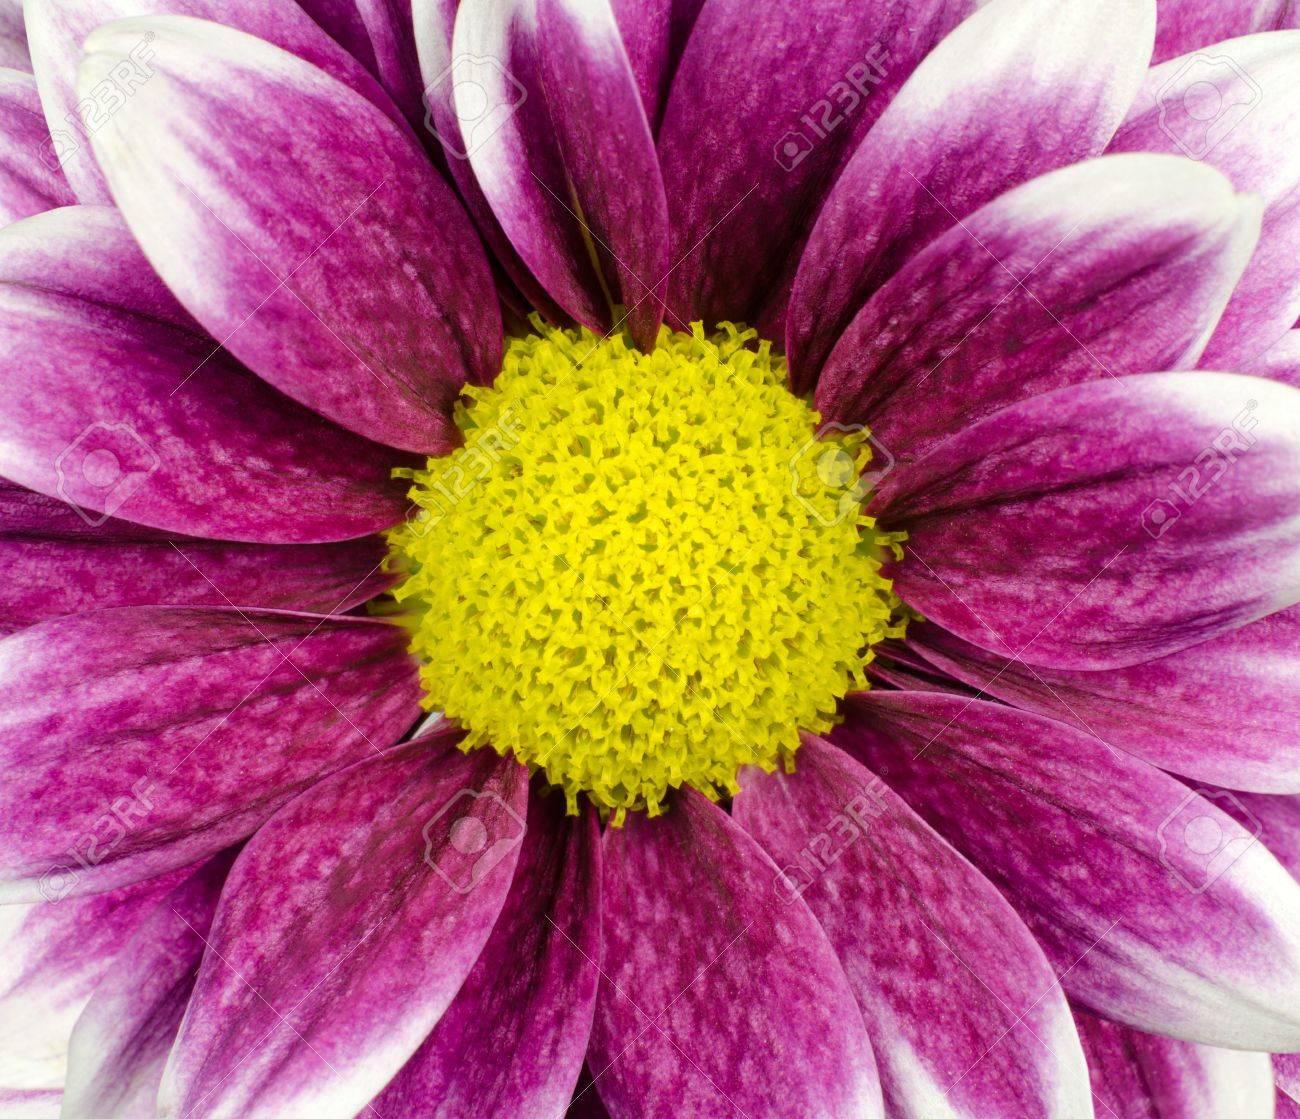 purple dahlia flower with yellow center macro frame stock photo, Beautiful flower